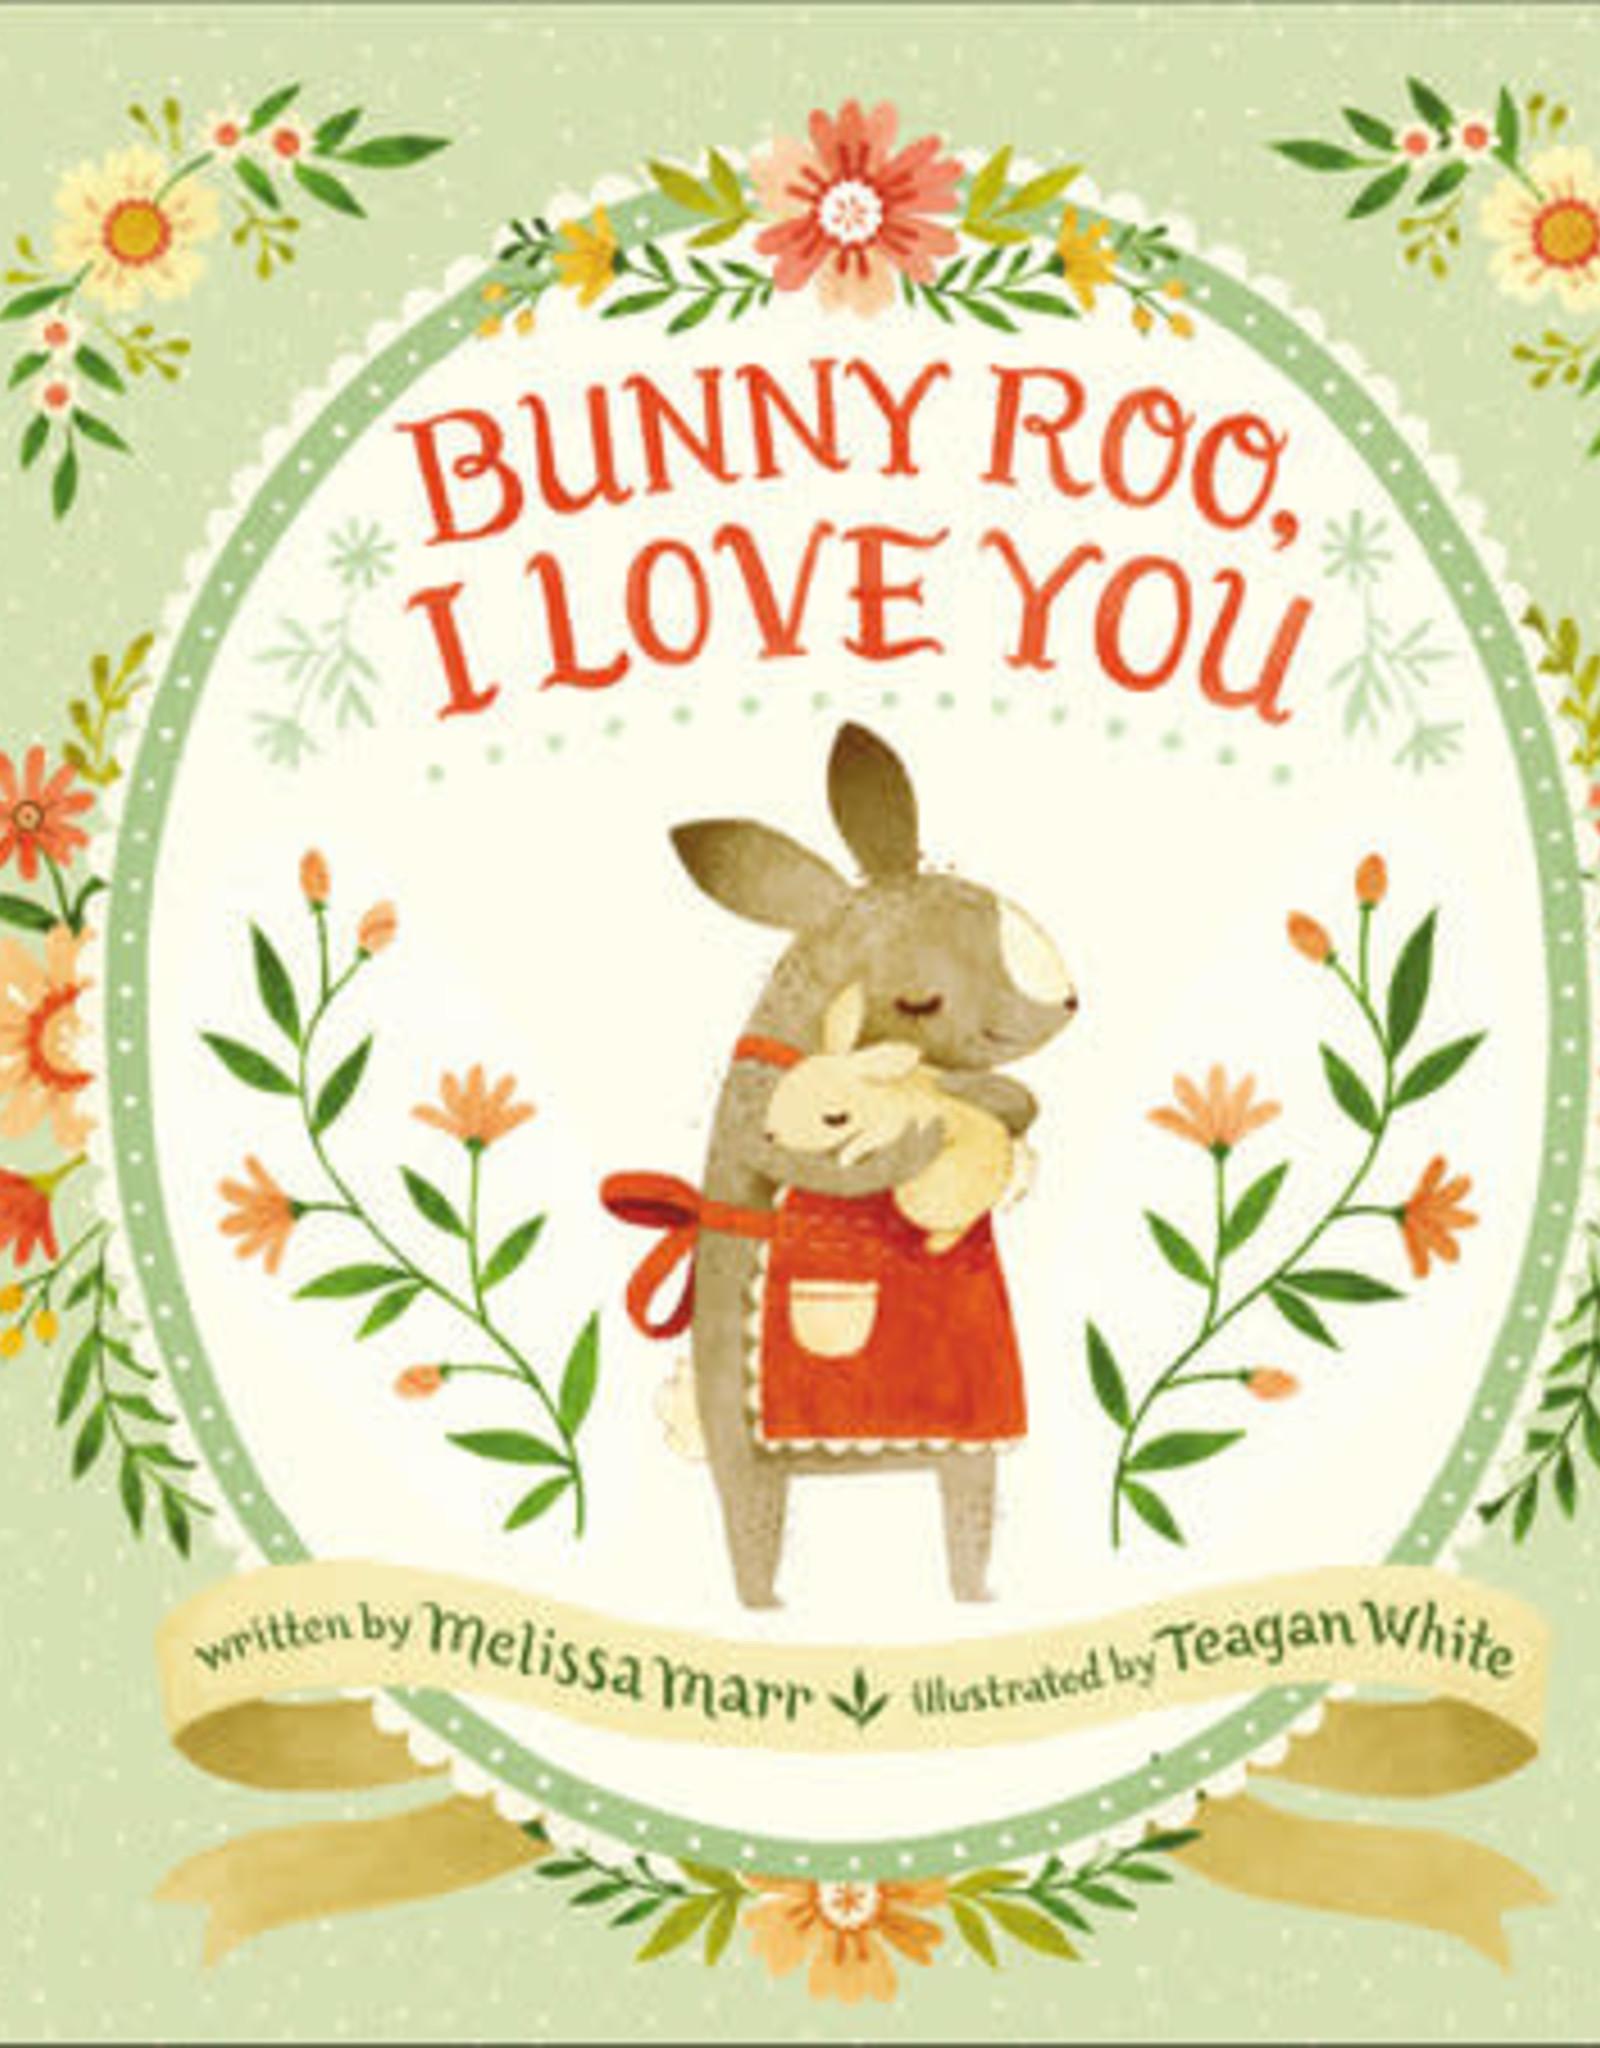 Penguin Random House Bunny Roo, I Love You